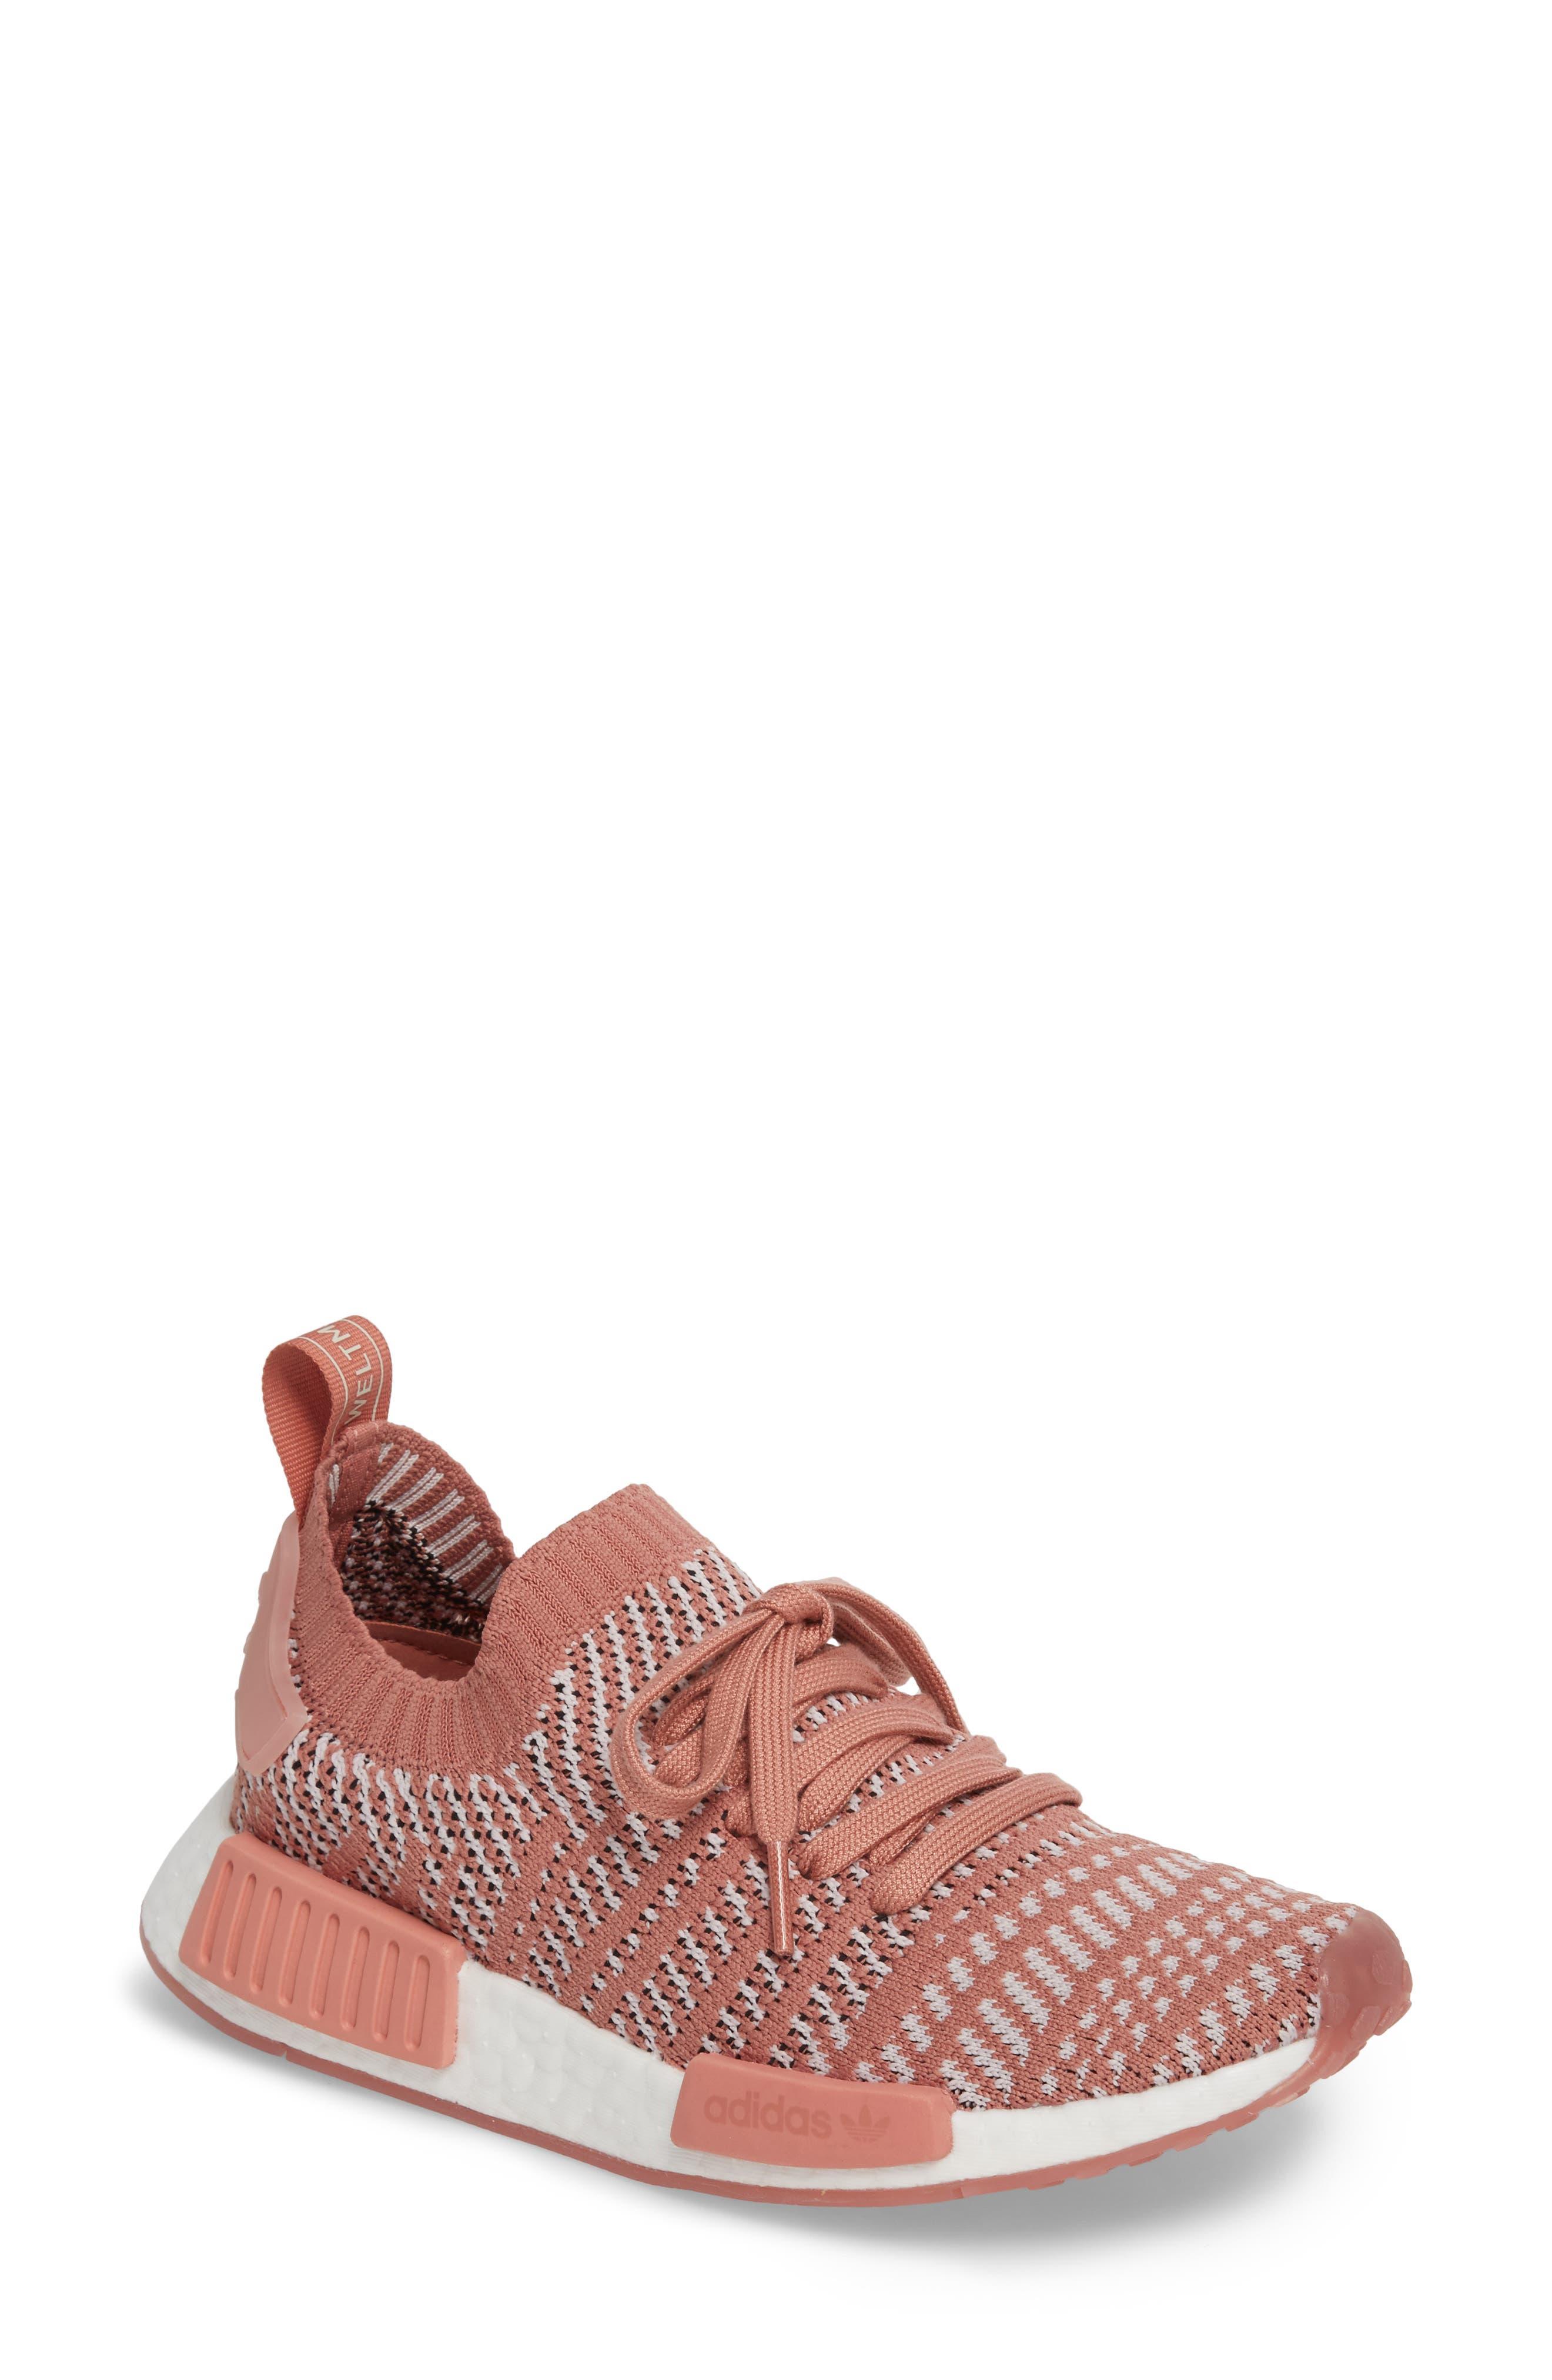 Main Image - adidas NMD R1 STLT Primeknit Sneaker (Women)